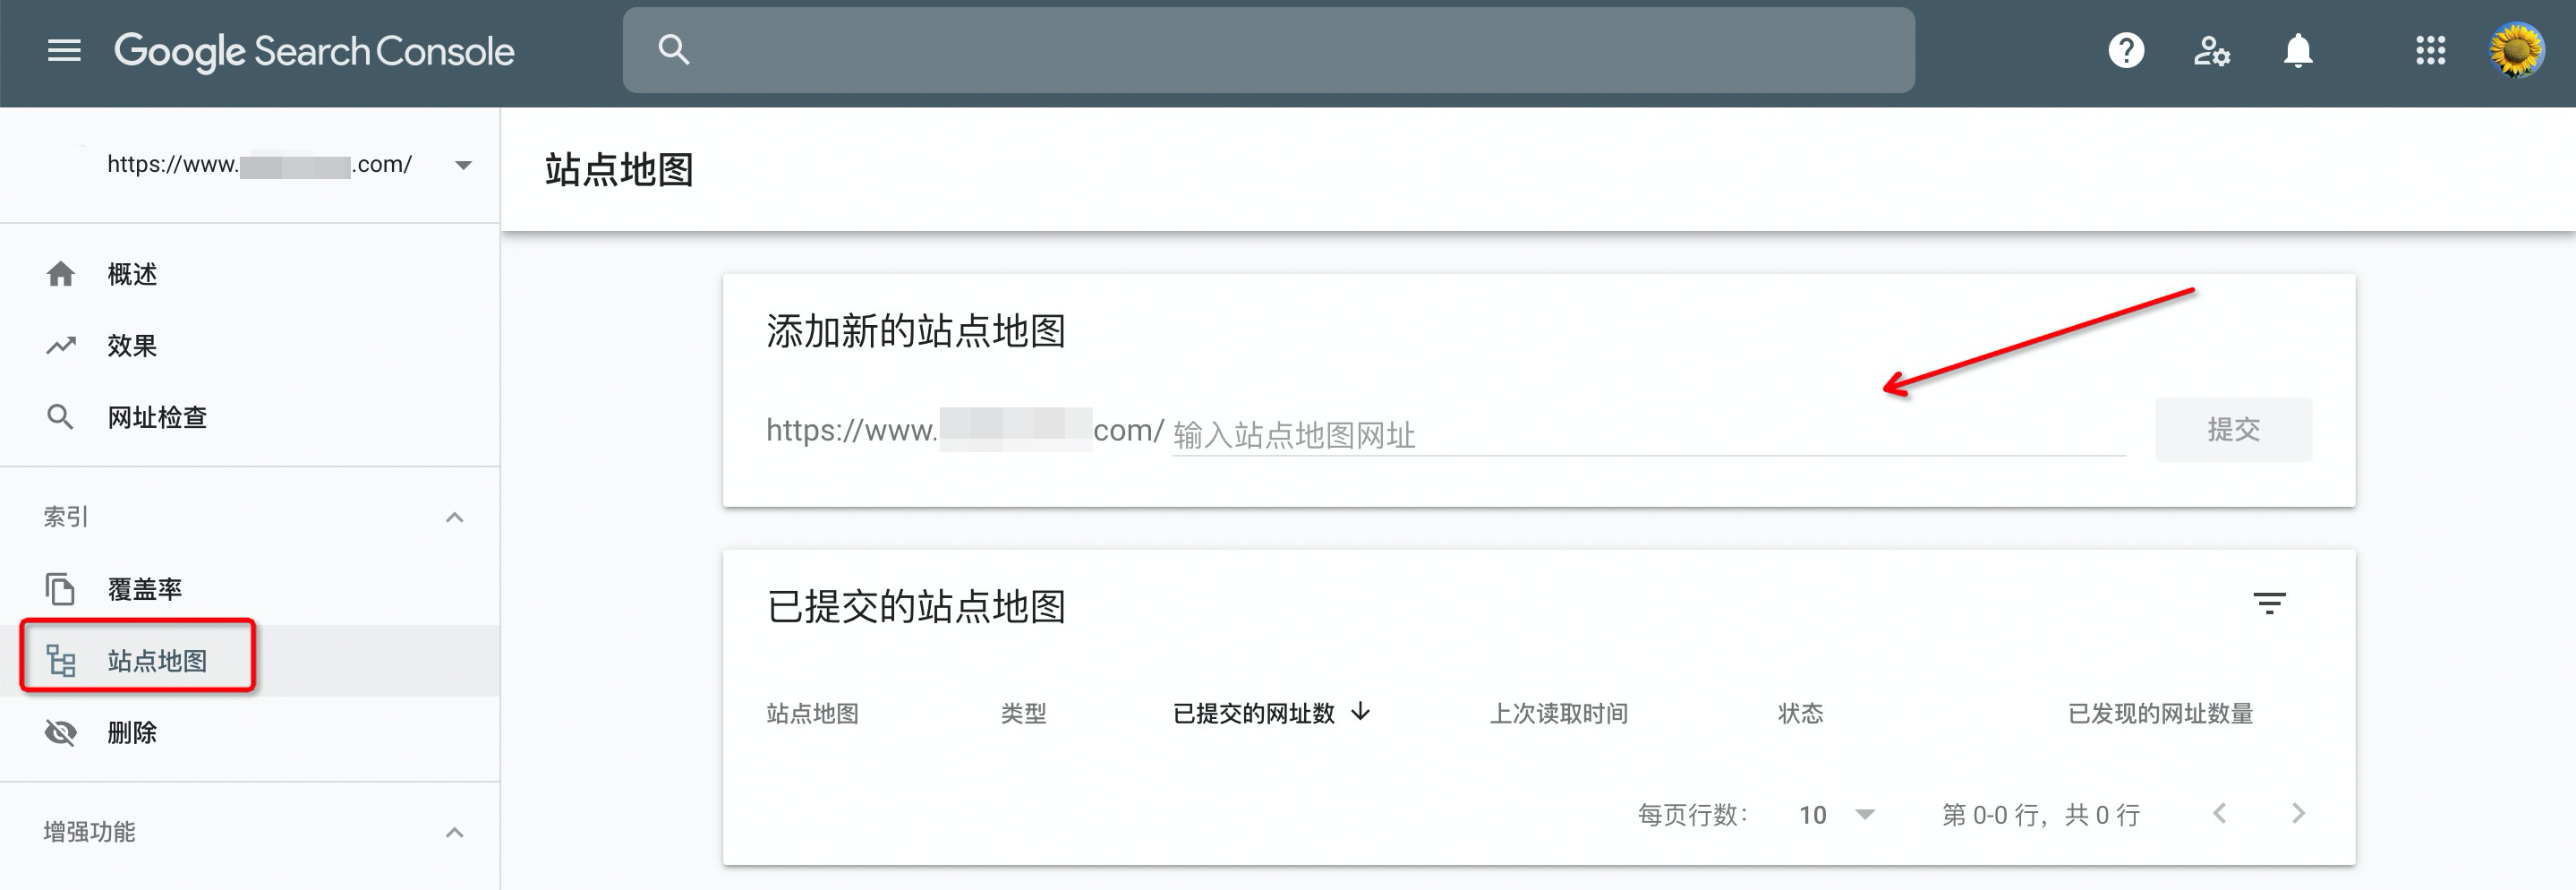 seo推广独立站容易吗